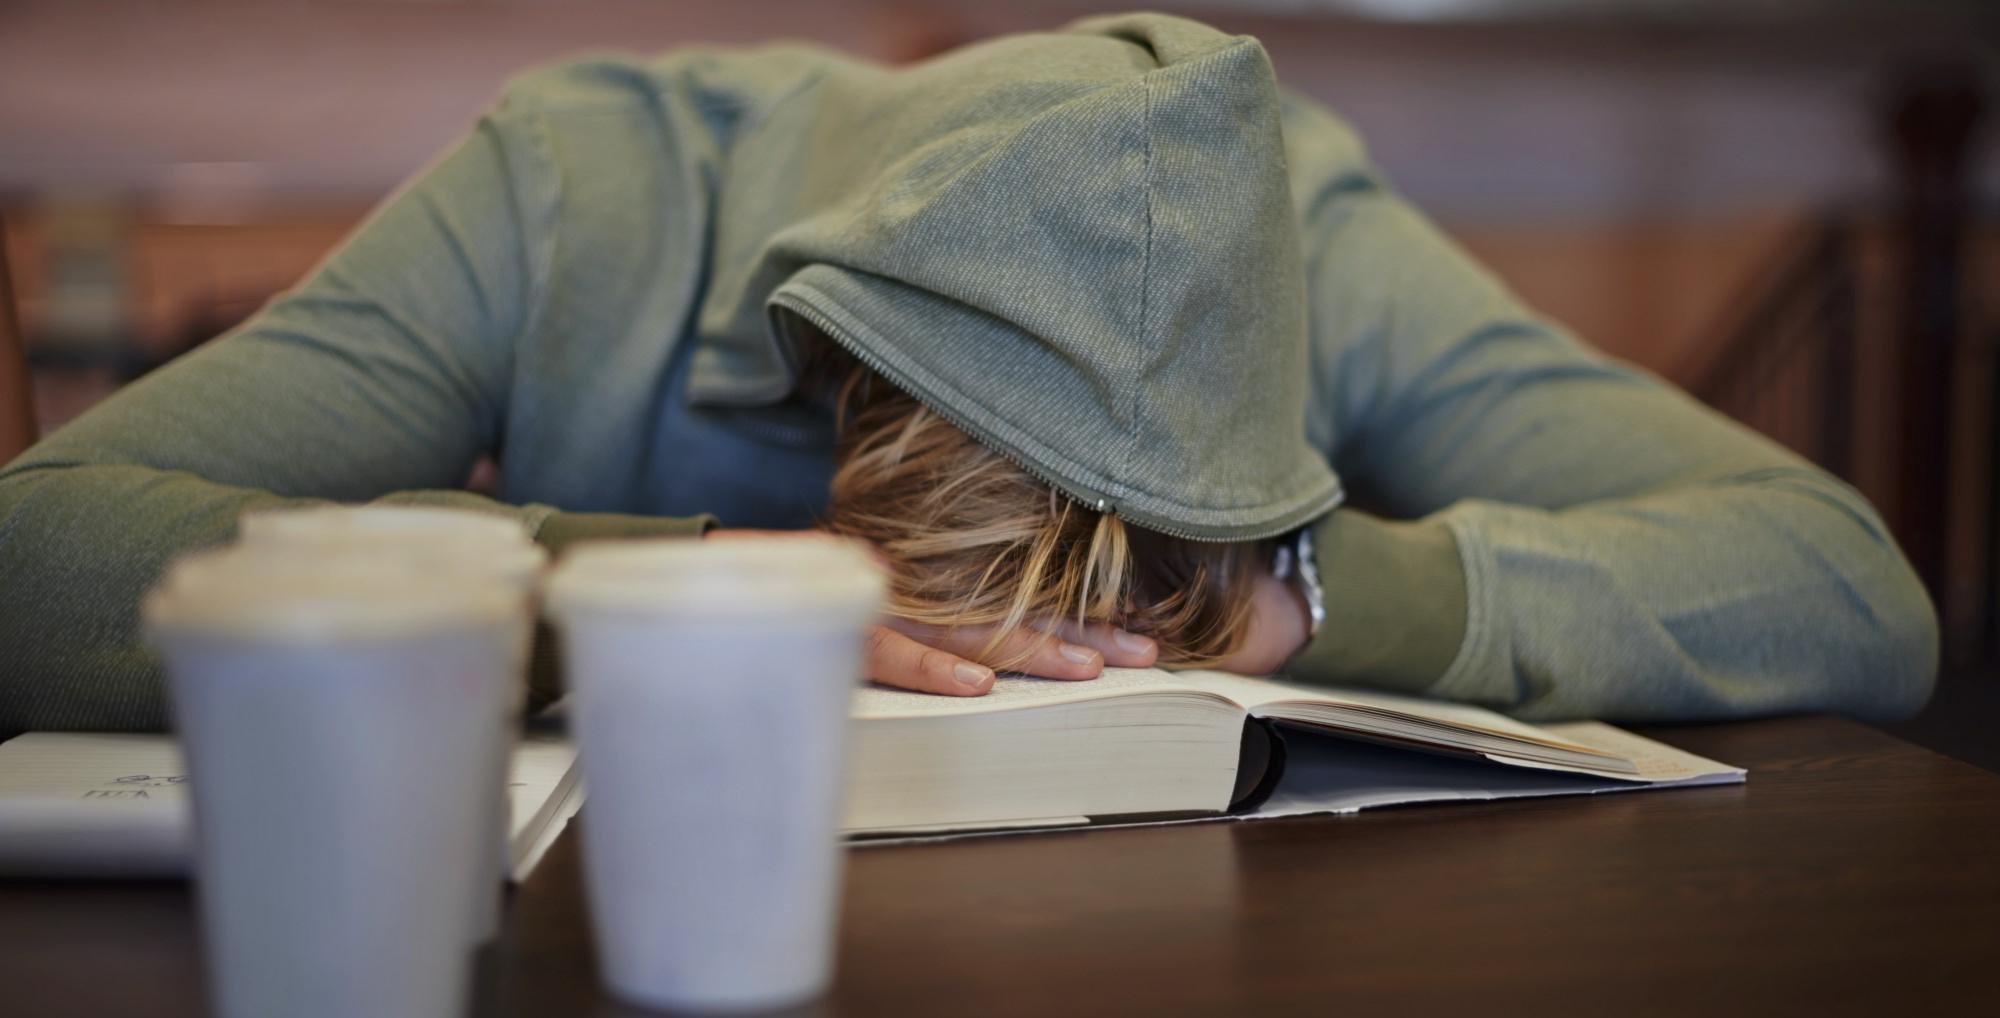 Porn Kills Grades: Research Shows XXX Content's Effect On Academics